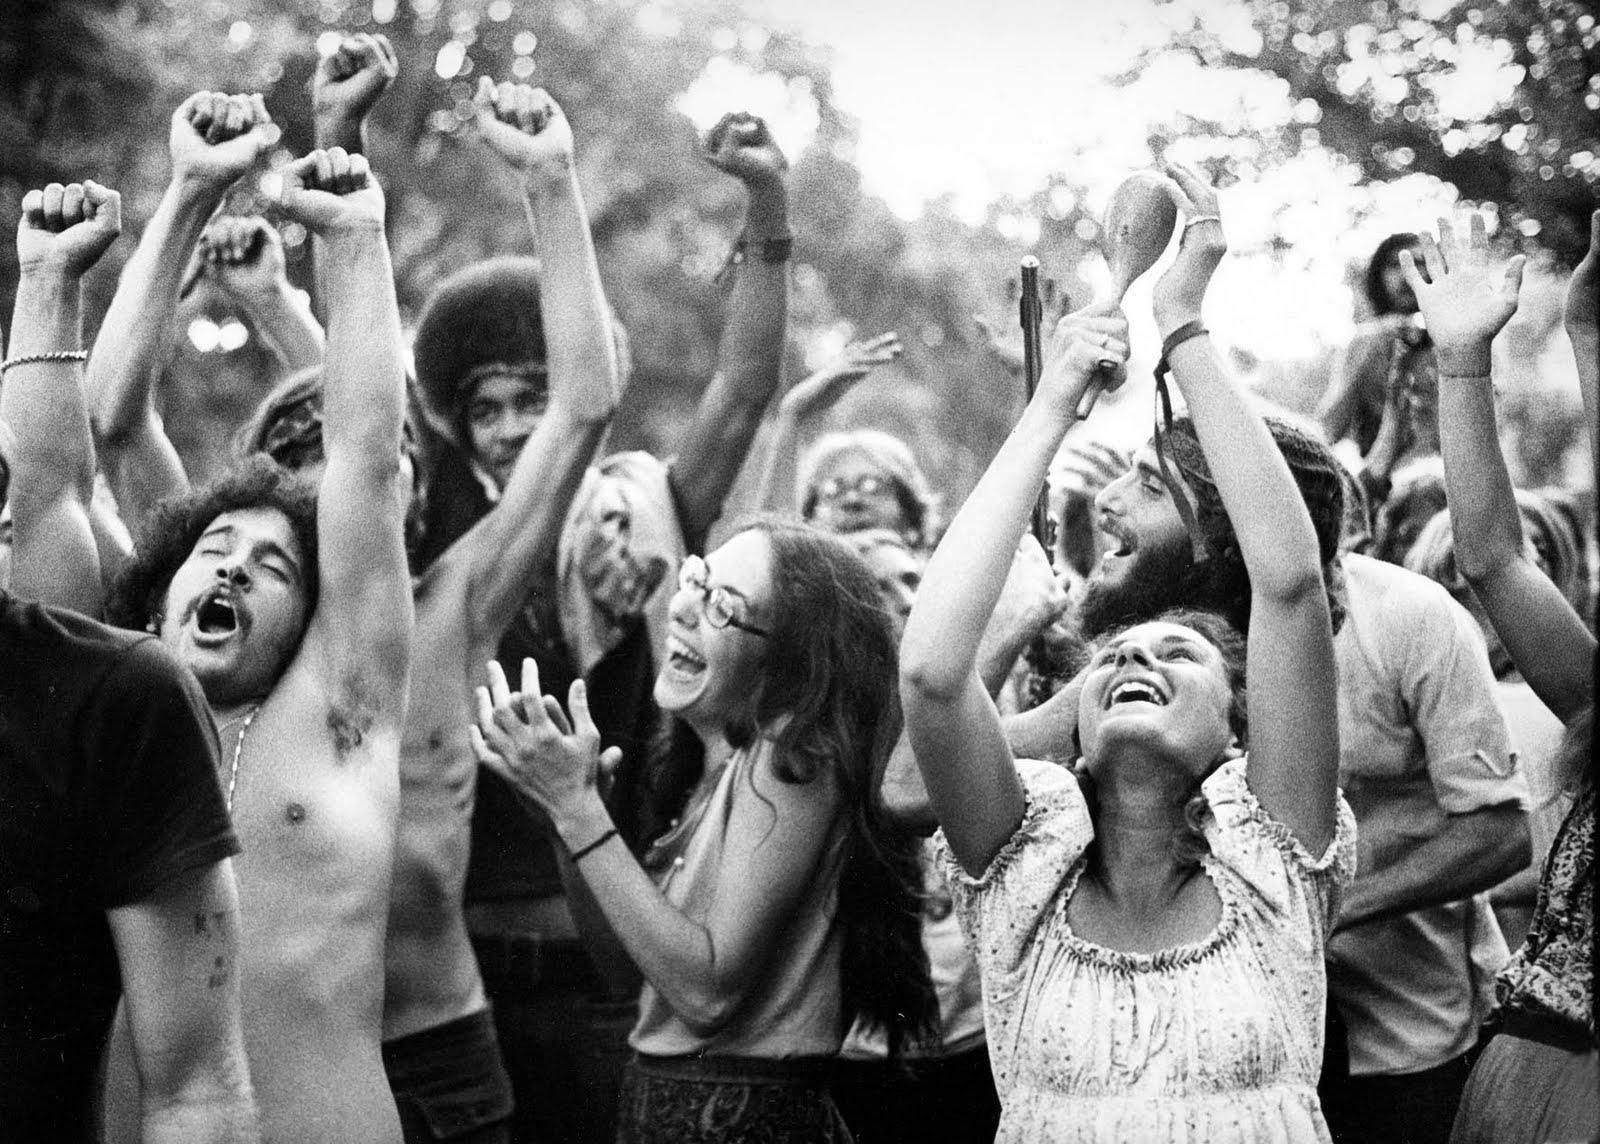 https://theunexpectedcosmology.com/wp-content/uploads/2020/11/00864-Summer-of-Love-1967-Travels-with-Gloria-travelswithgloria.wordpress.com-pic.jpg